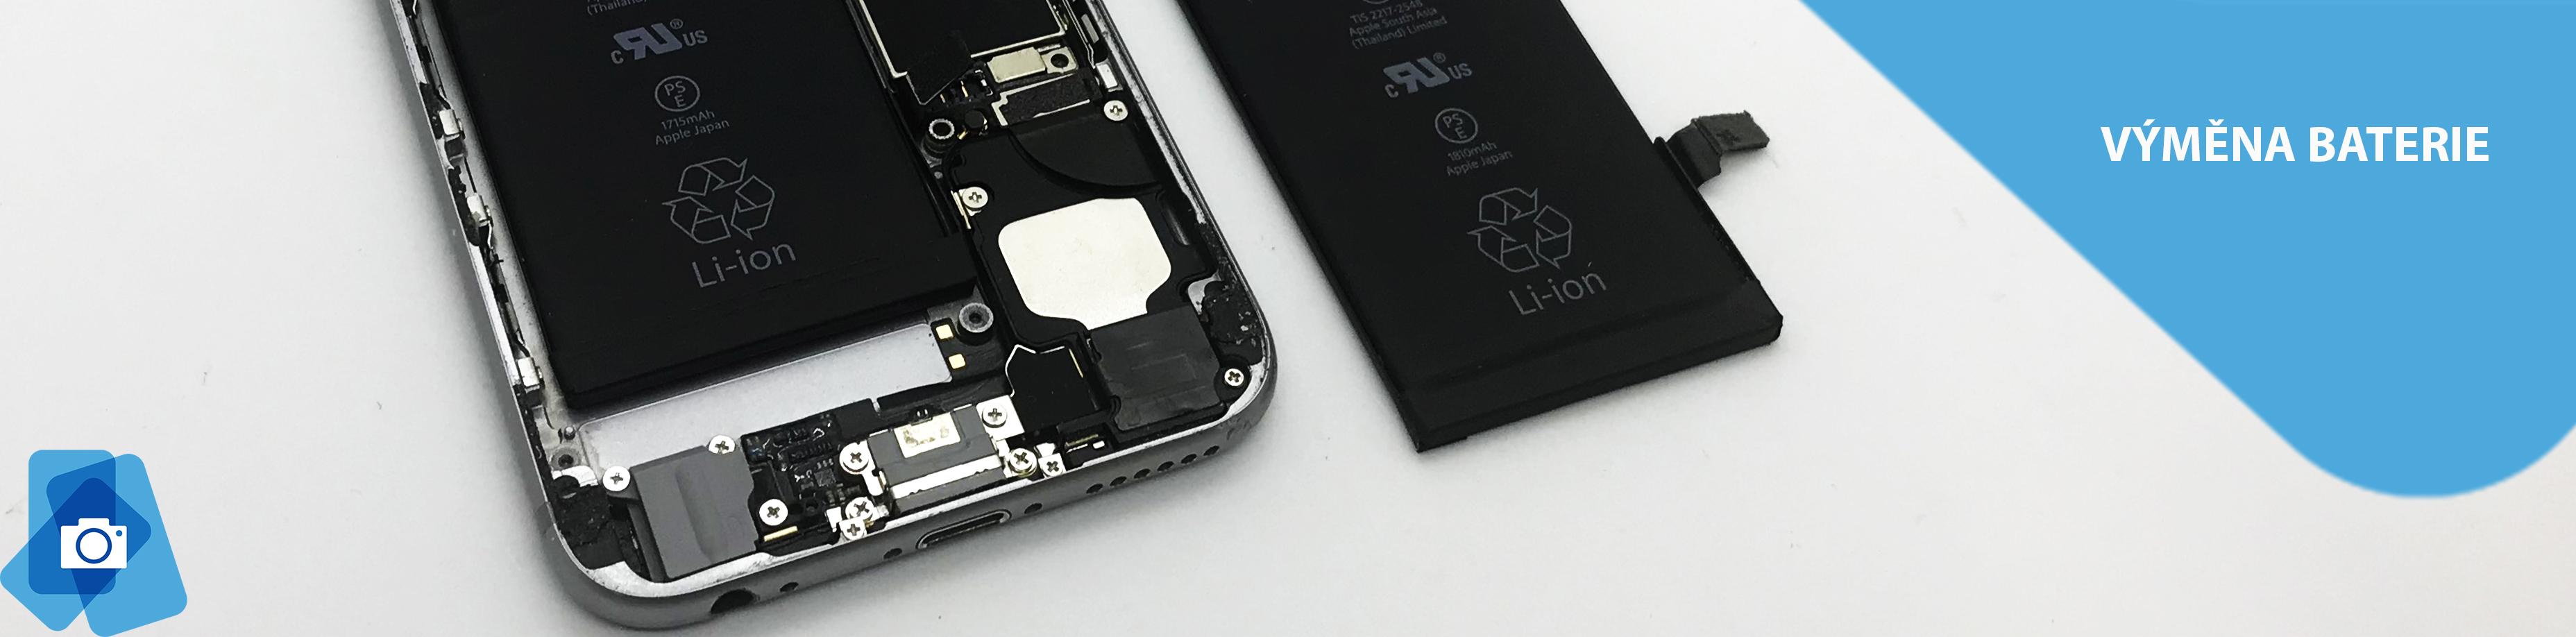 Výměna Baterie iPhone Praha-5